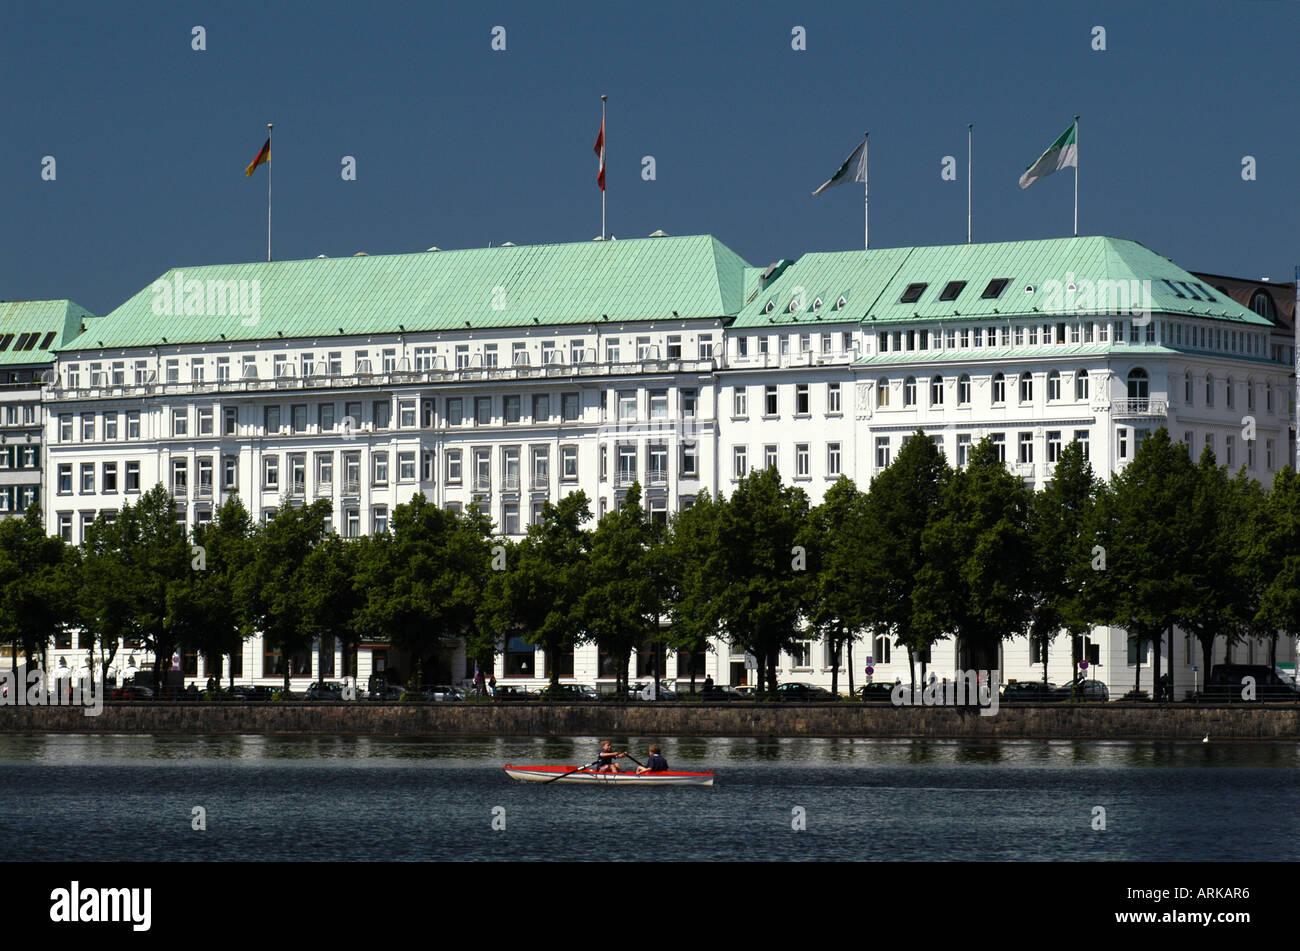 The Luxury Hotel Raffles Vier Jahreszeiten Four Seasons In The City Stock Photo Alamy